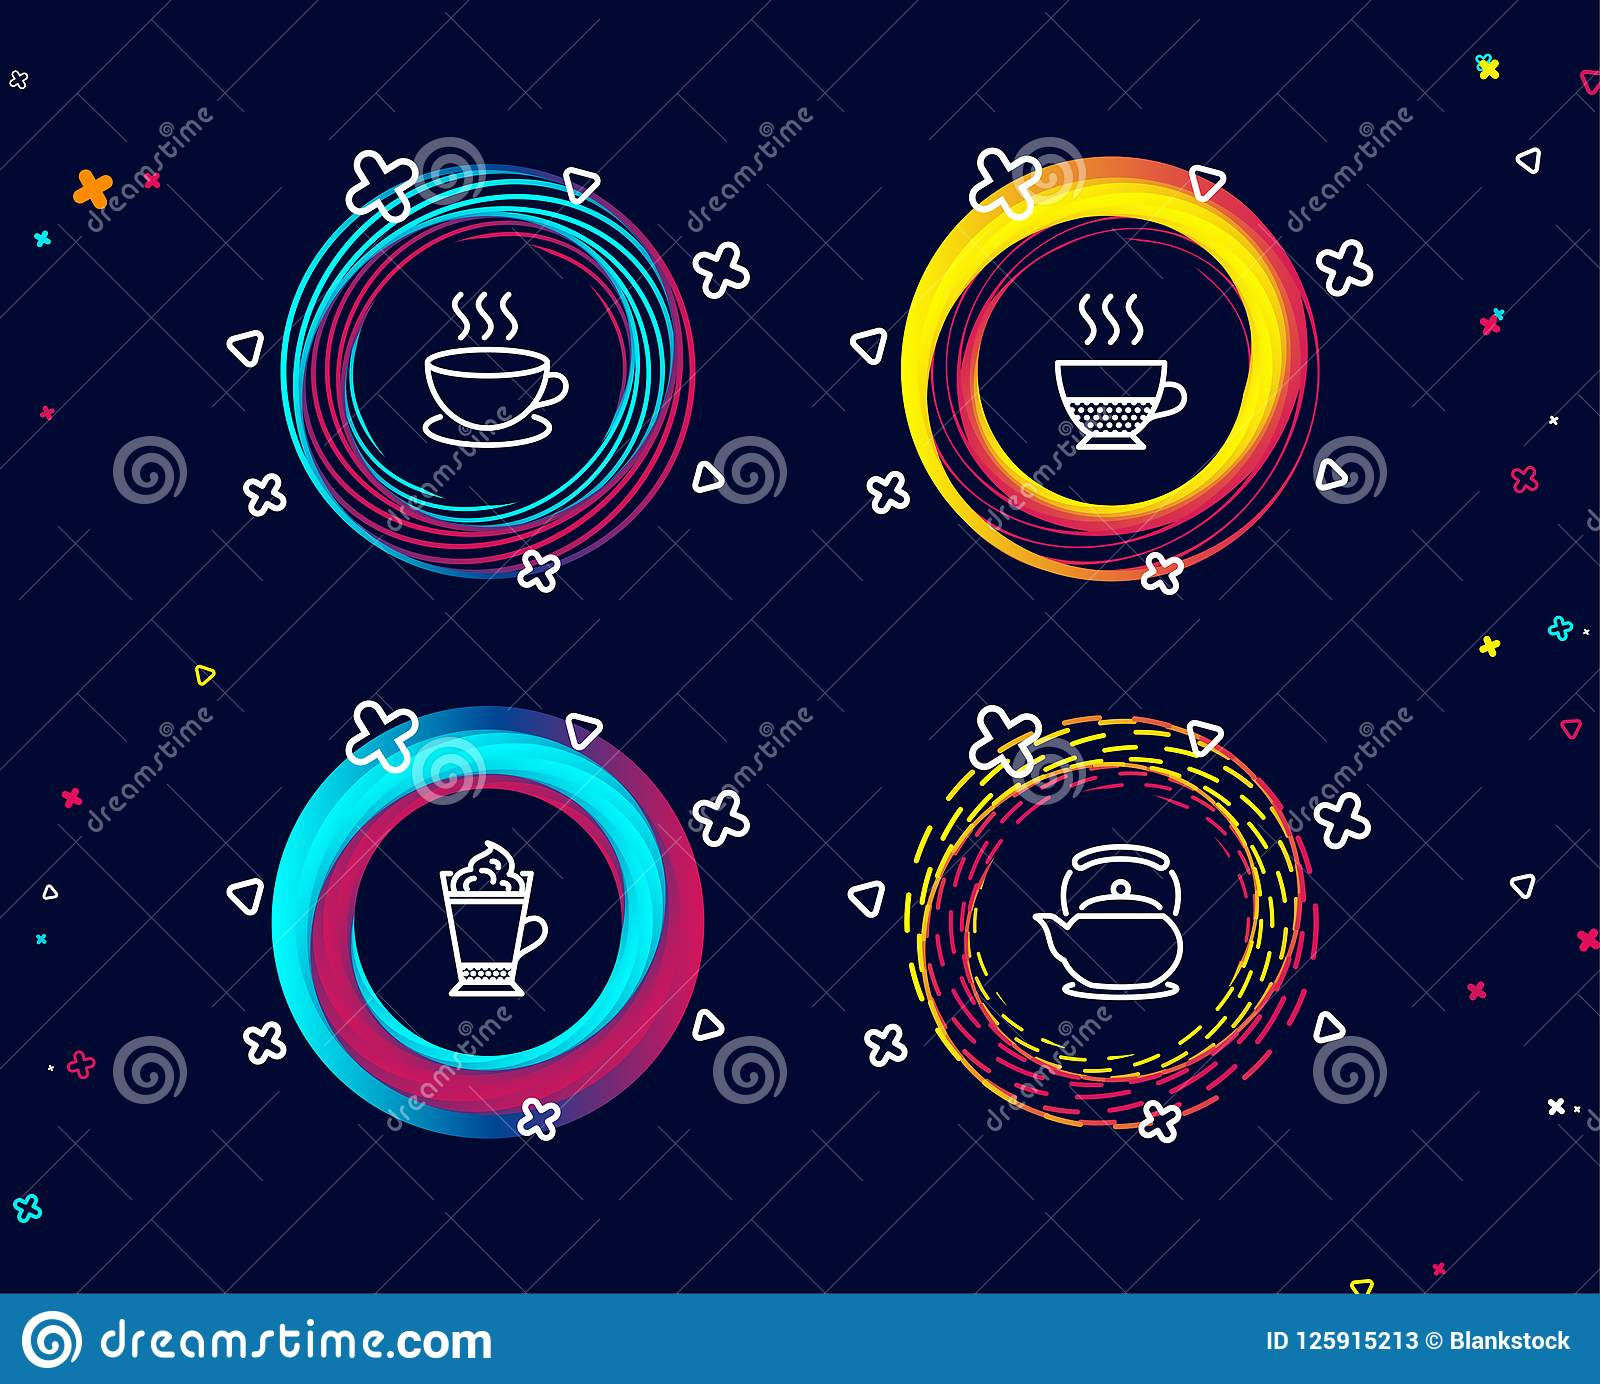 Cappuccino, Latte Coffee And Doppio Icons. Teapot Sign